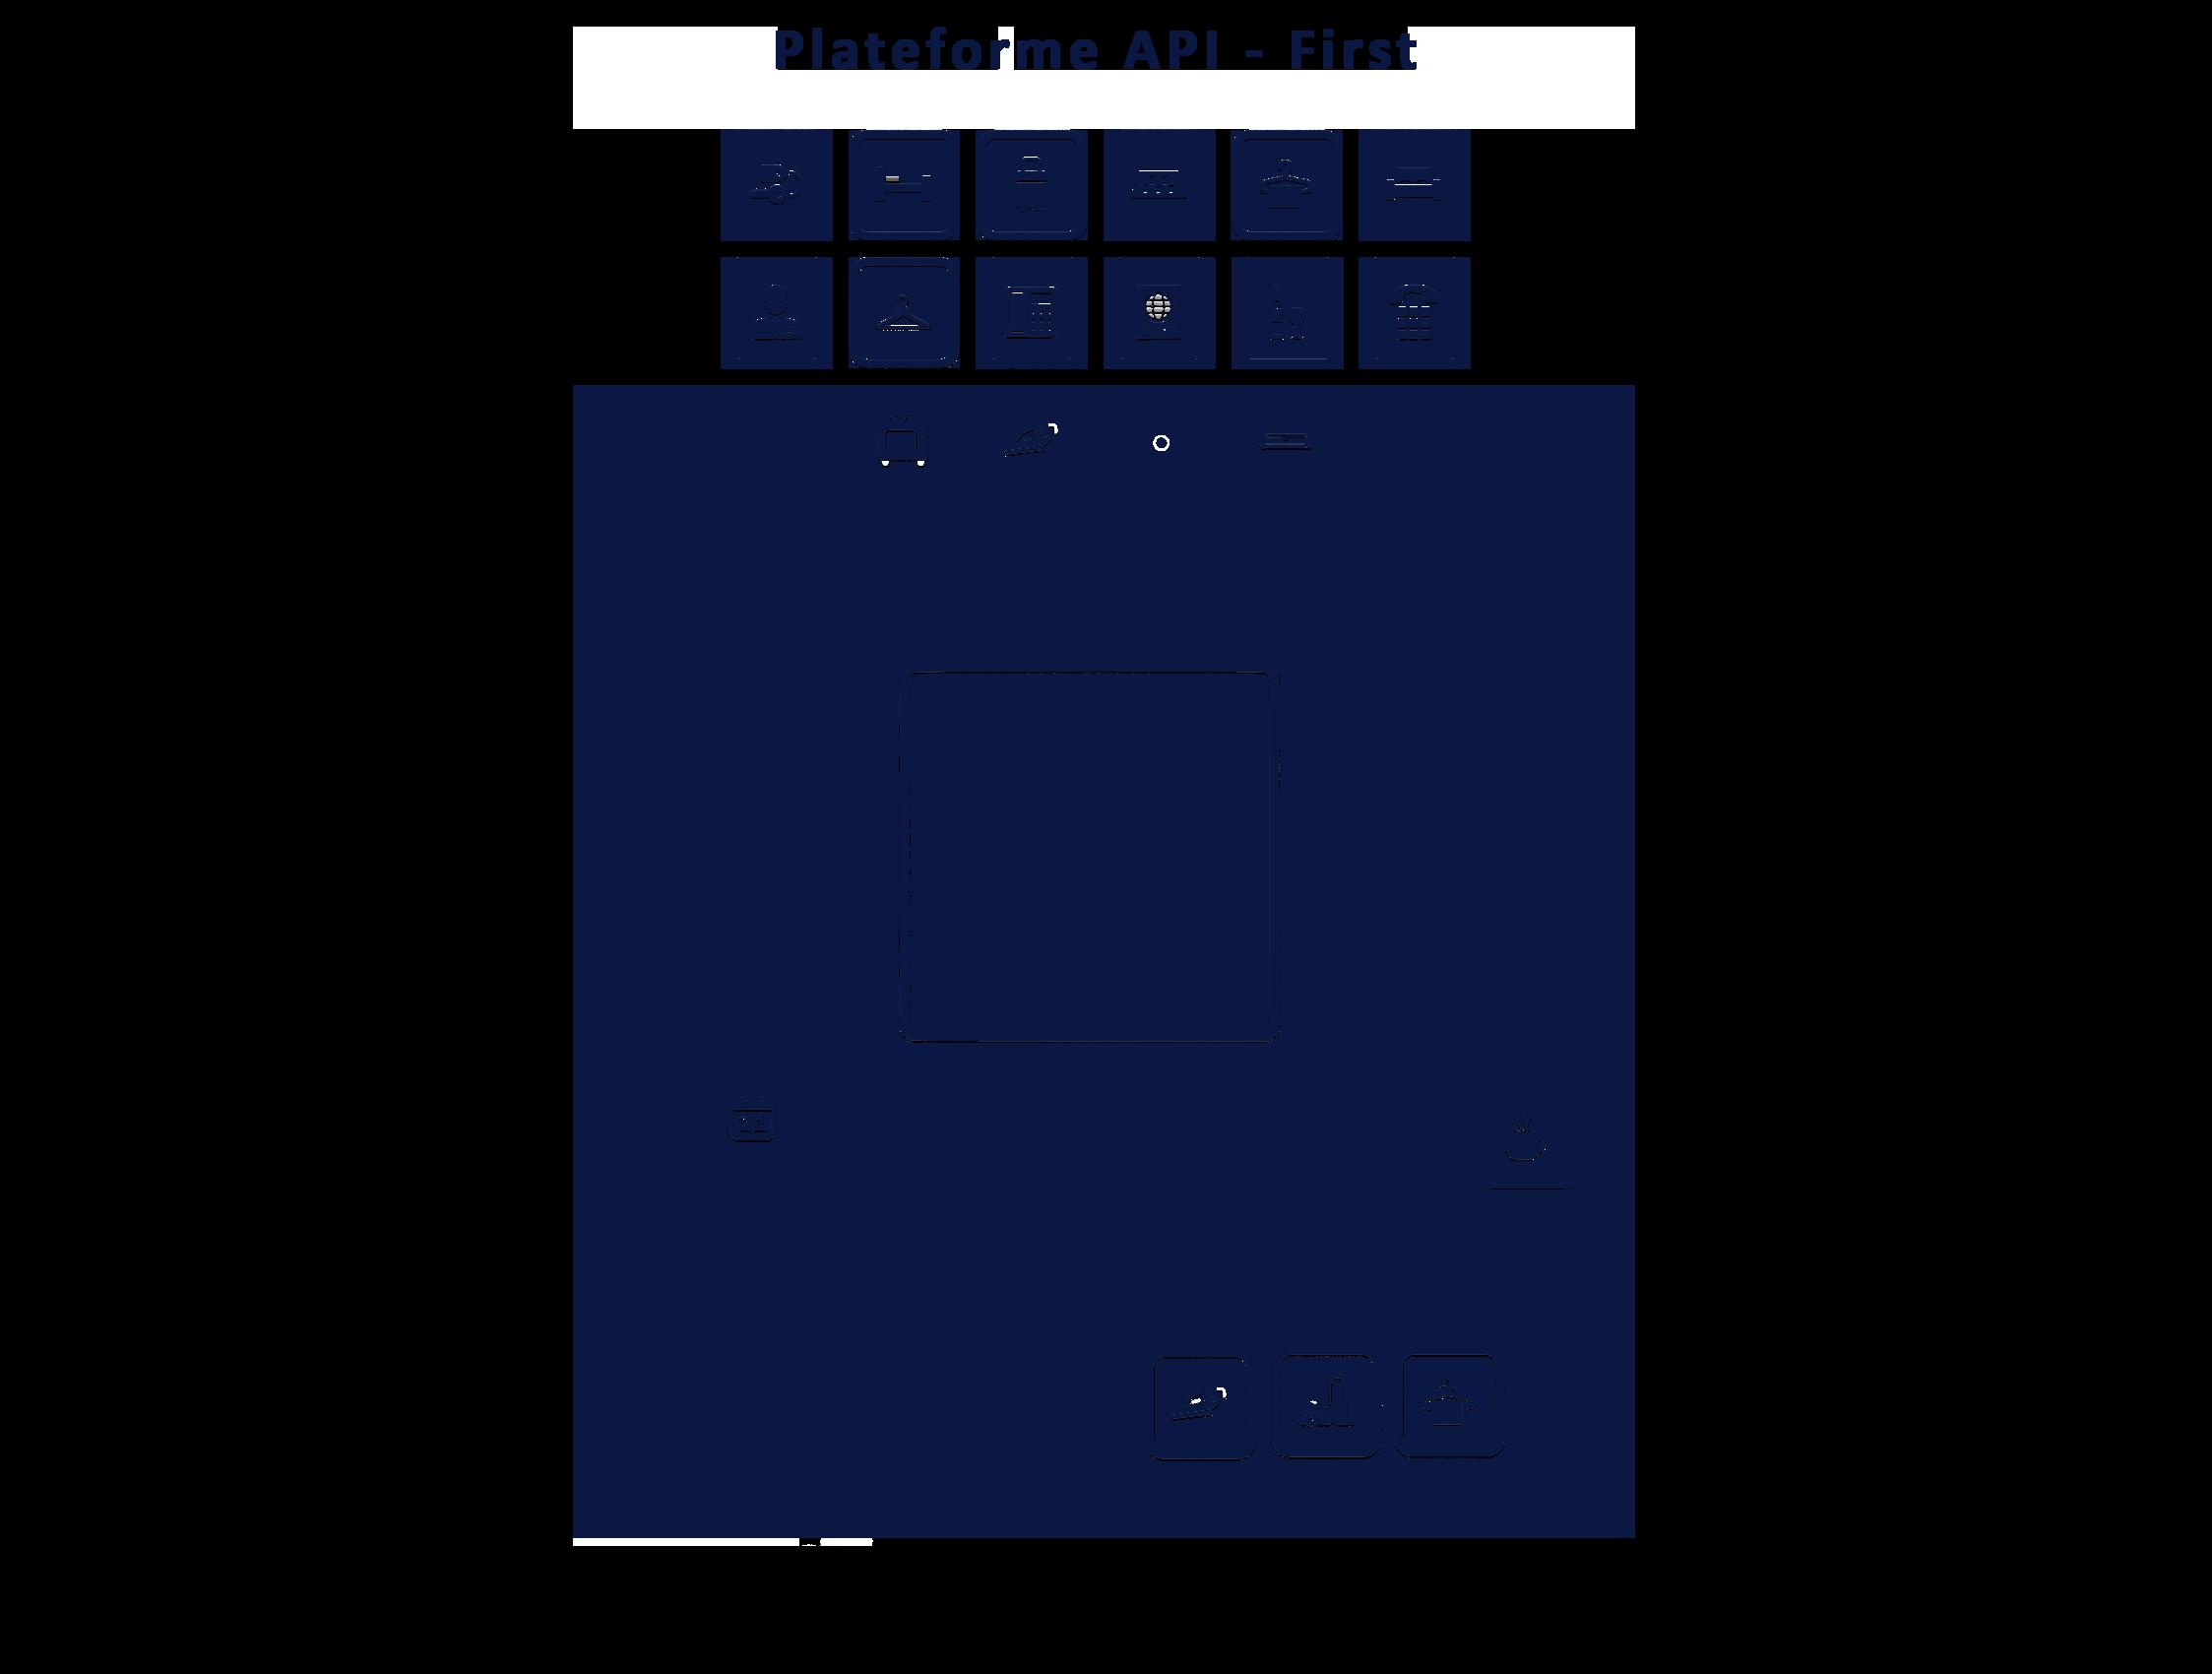 API - First